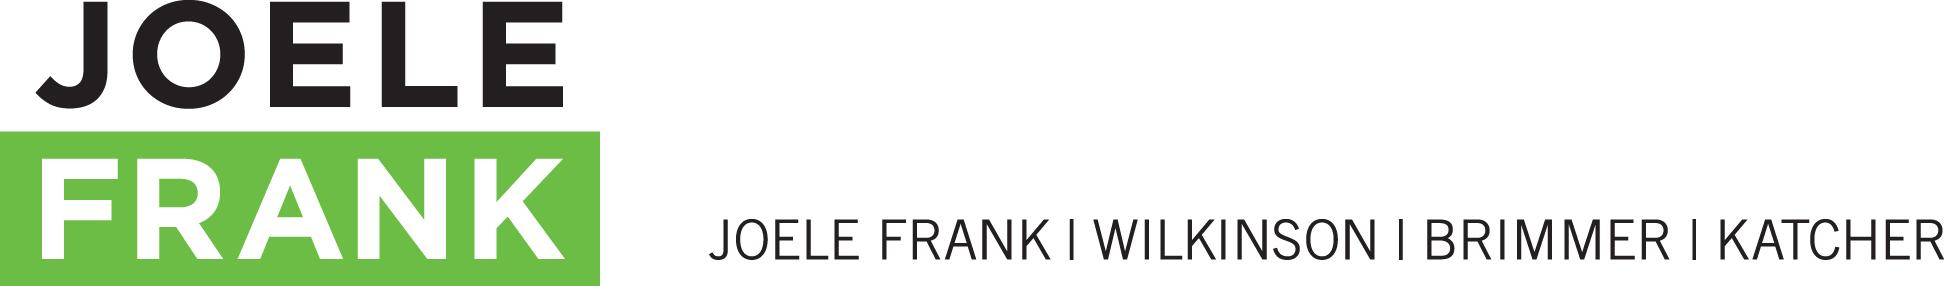 Joele Frank